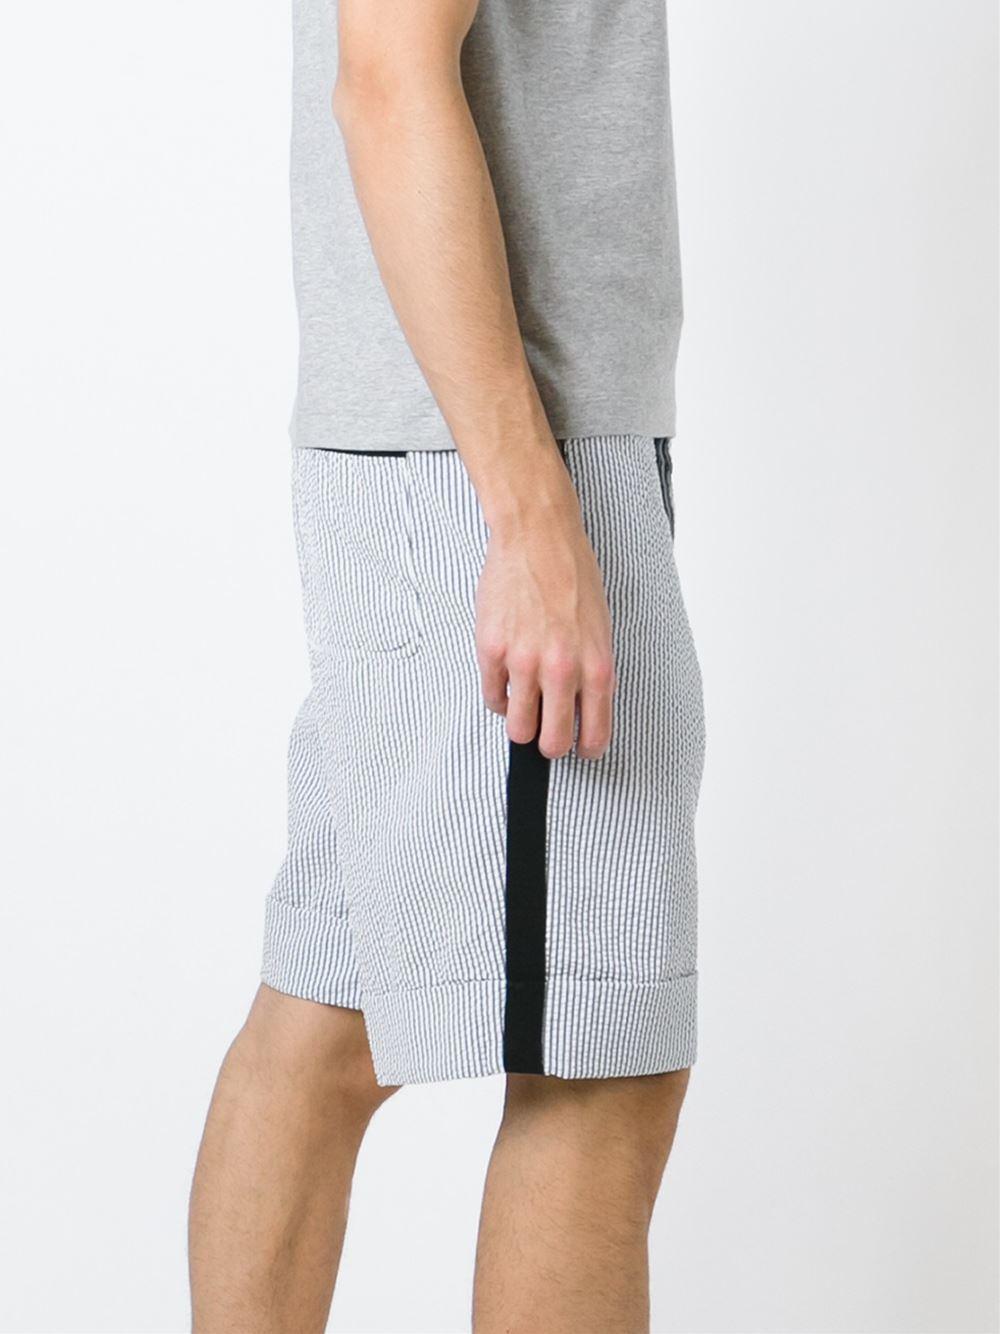 90516fa38fd8 Lyst - Moncler Gamme Bleu Striped Shorts in Blue for Men